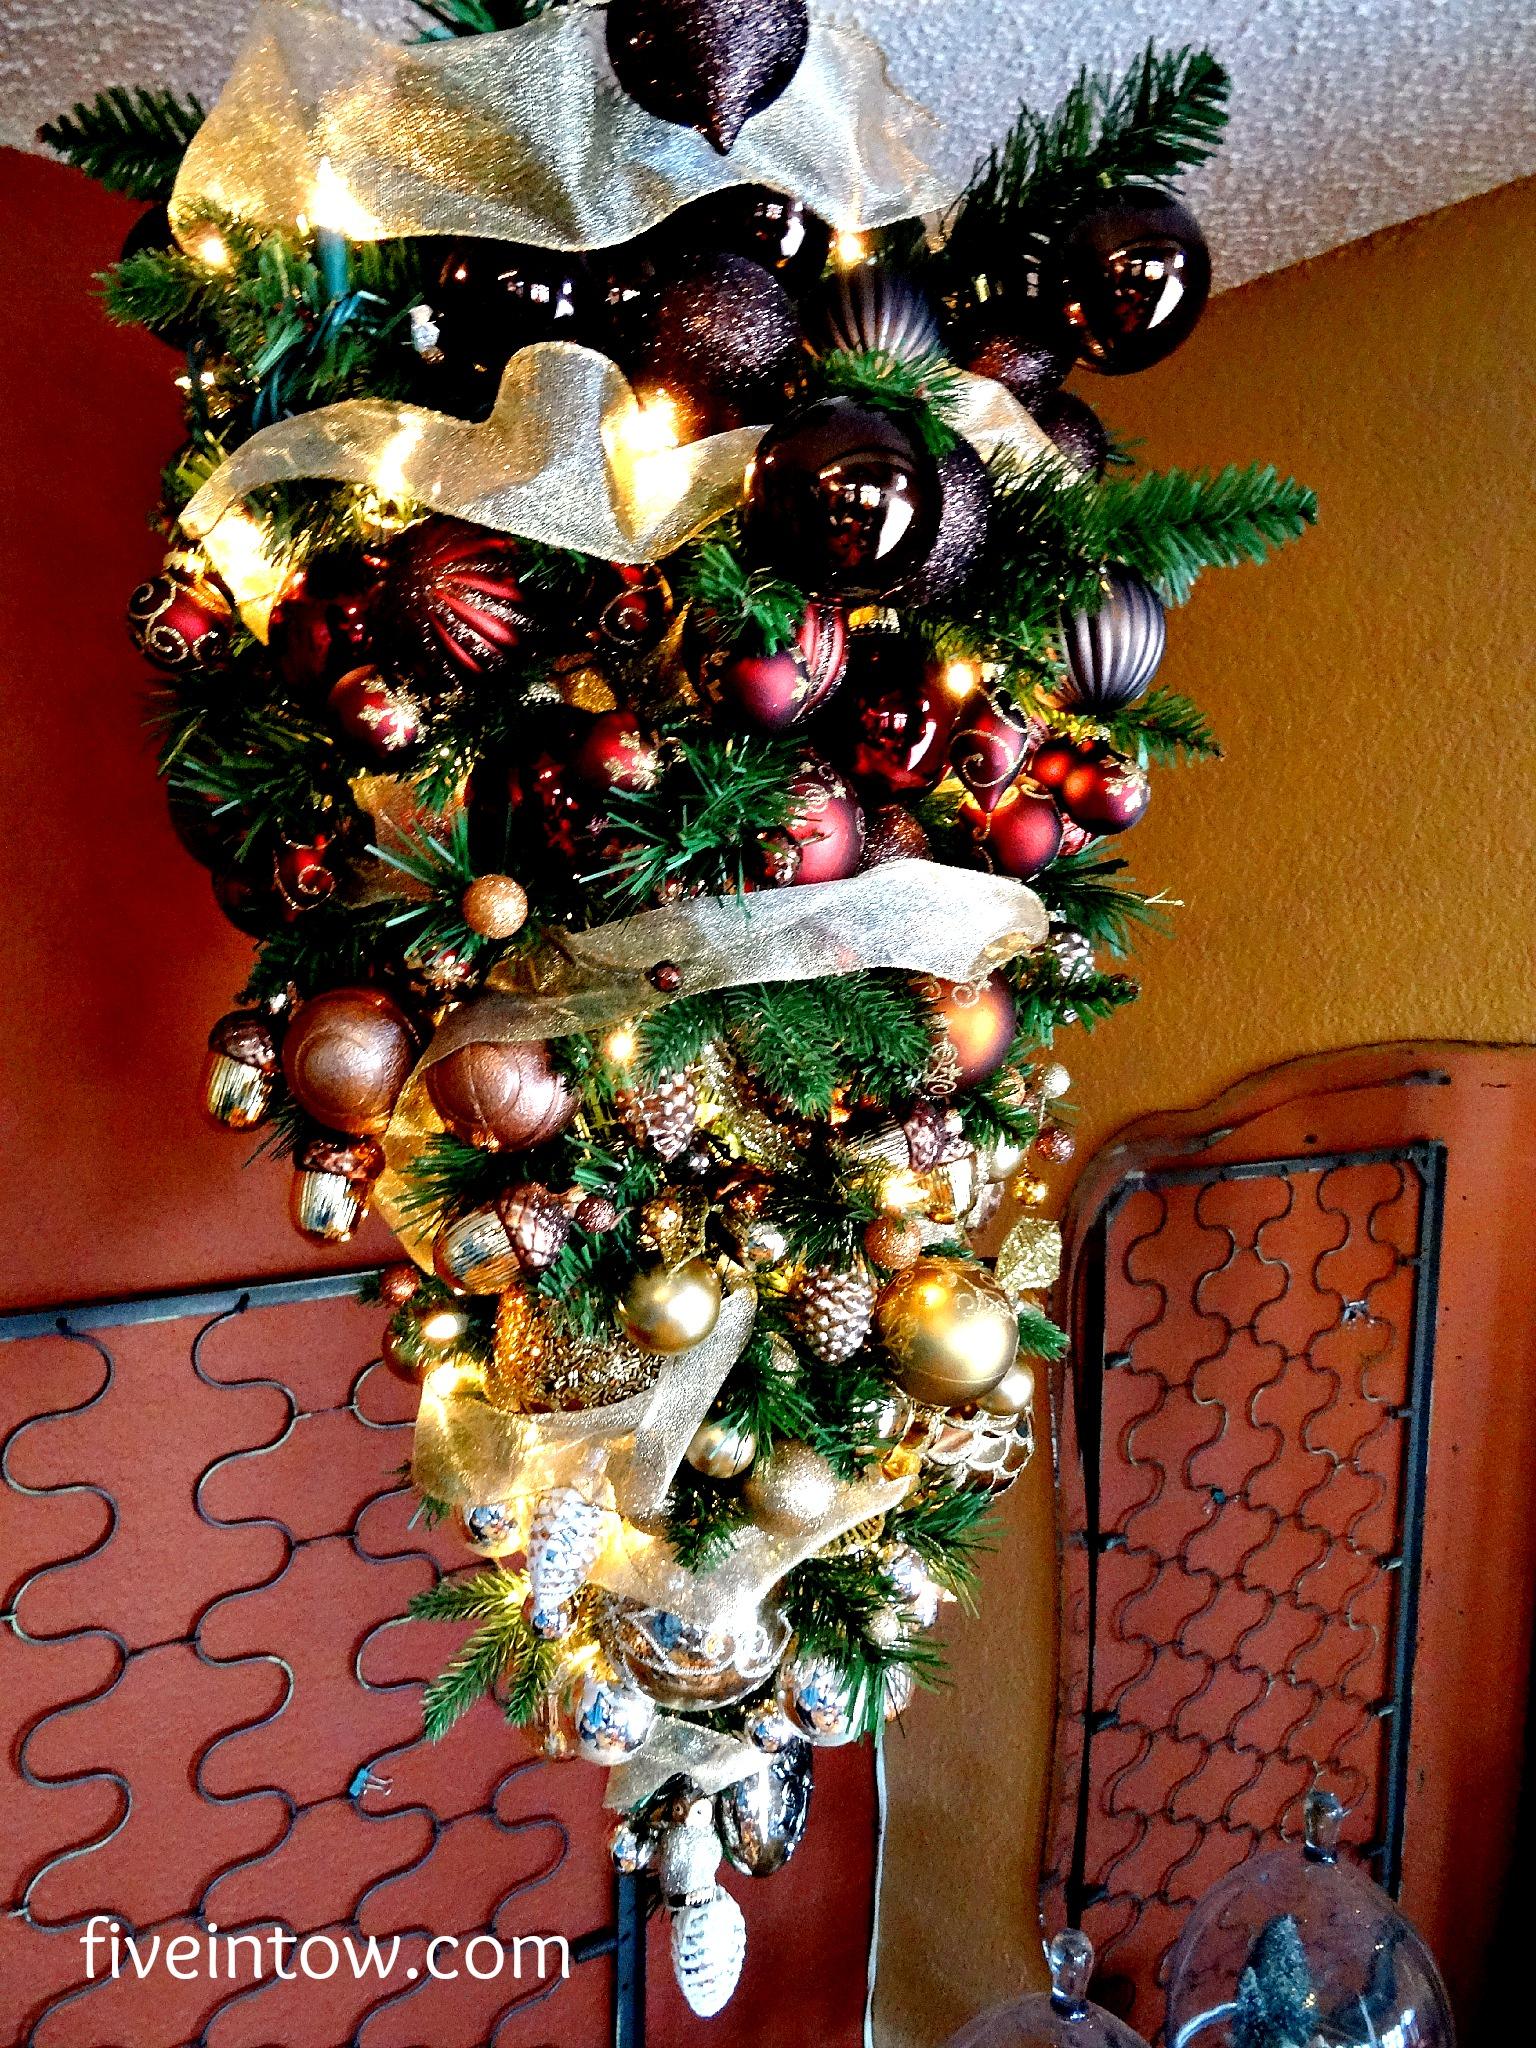 Simply Homemade: Inverted Christmas Tree - Kristen Anne Glover